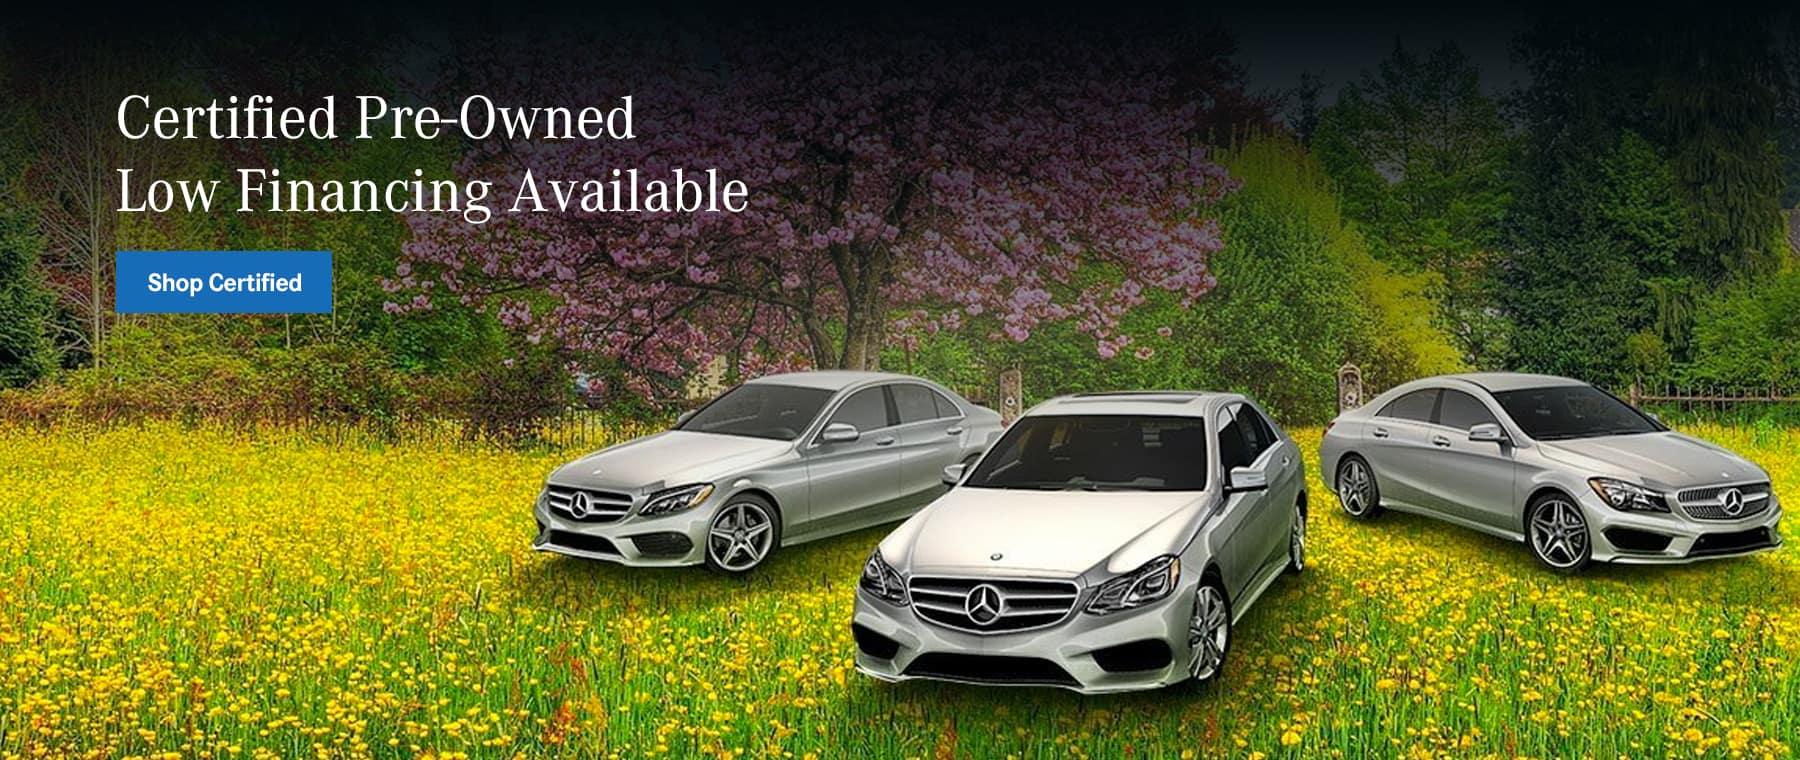 Mercedes-Benz Dealer in Greenwich, CT | Mercedes-Benz of